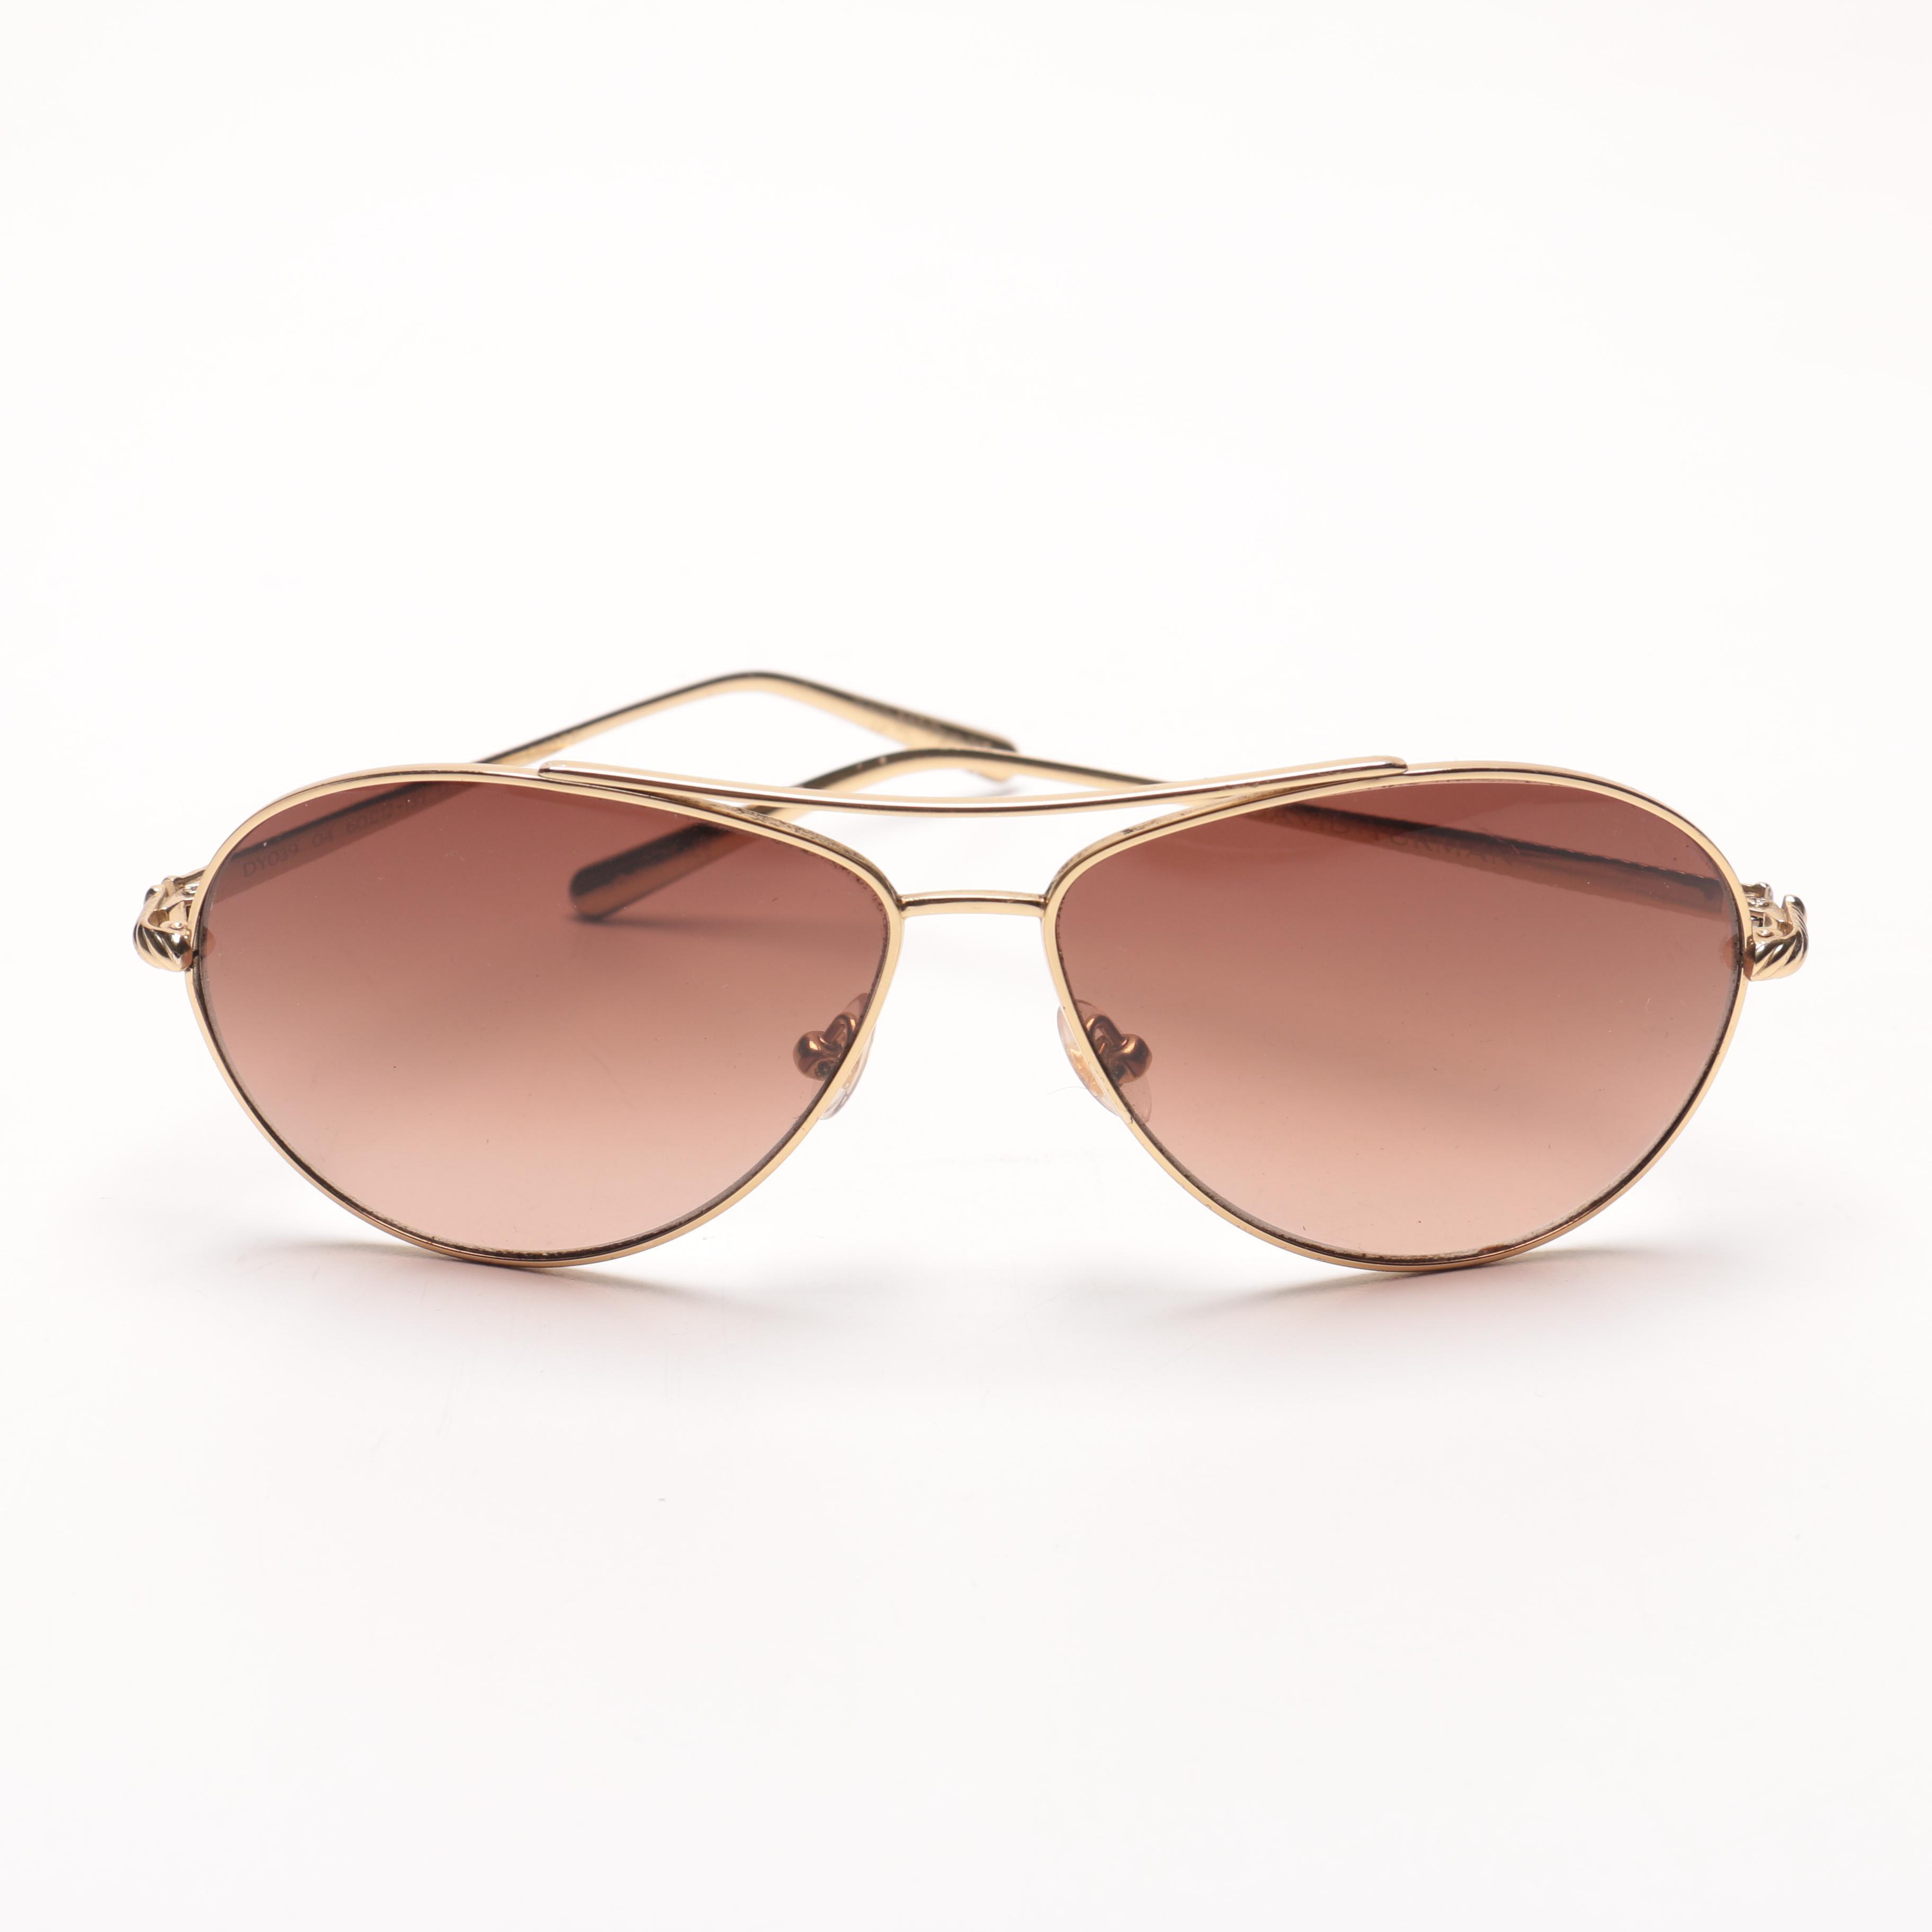 David Yurman Aviator Sunglasses